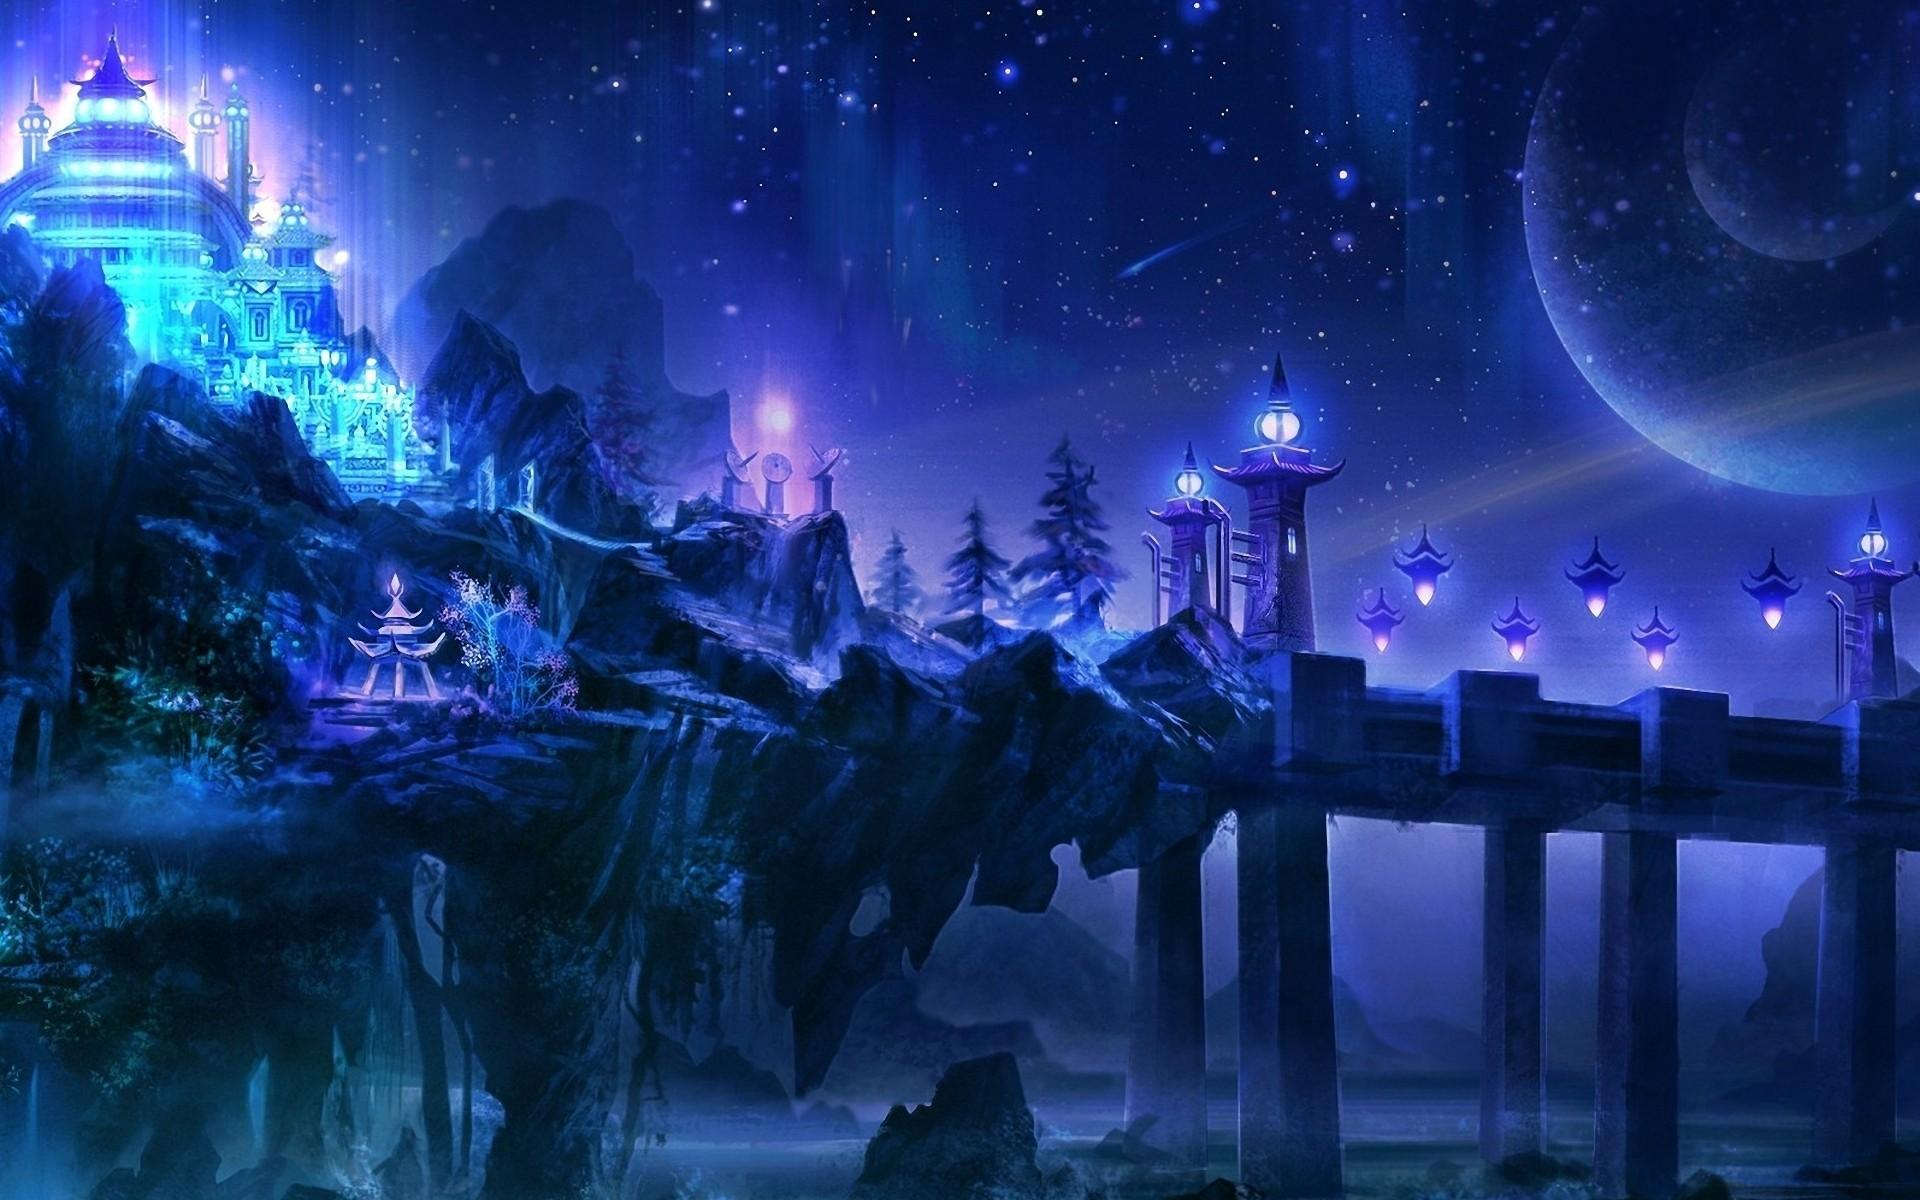 Fantasy Landscape Castle Wallpapers HD